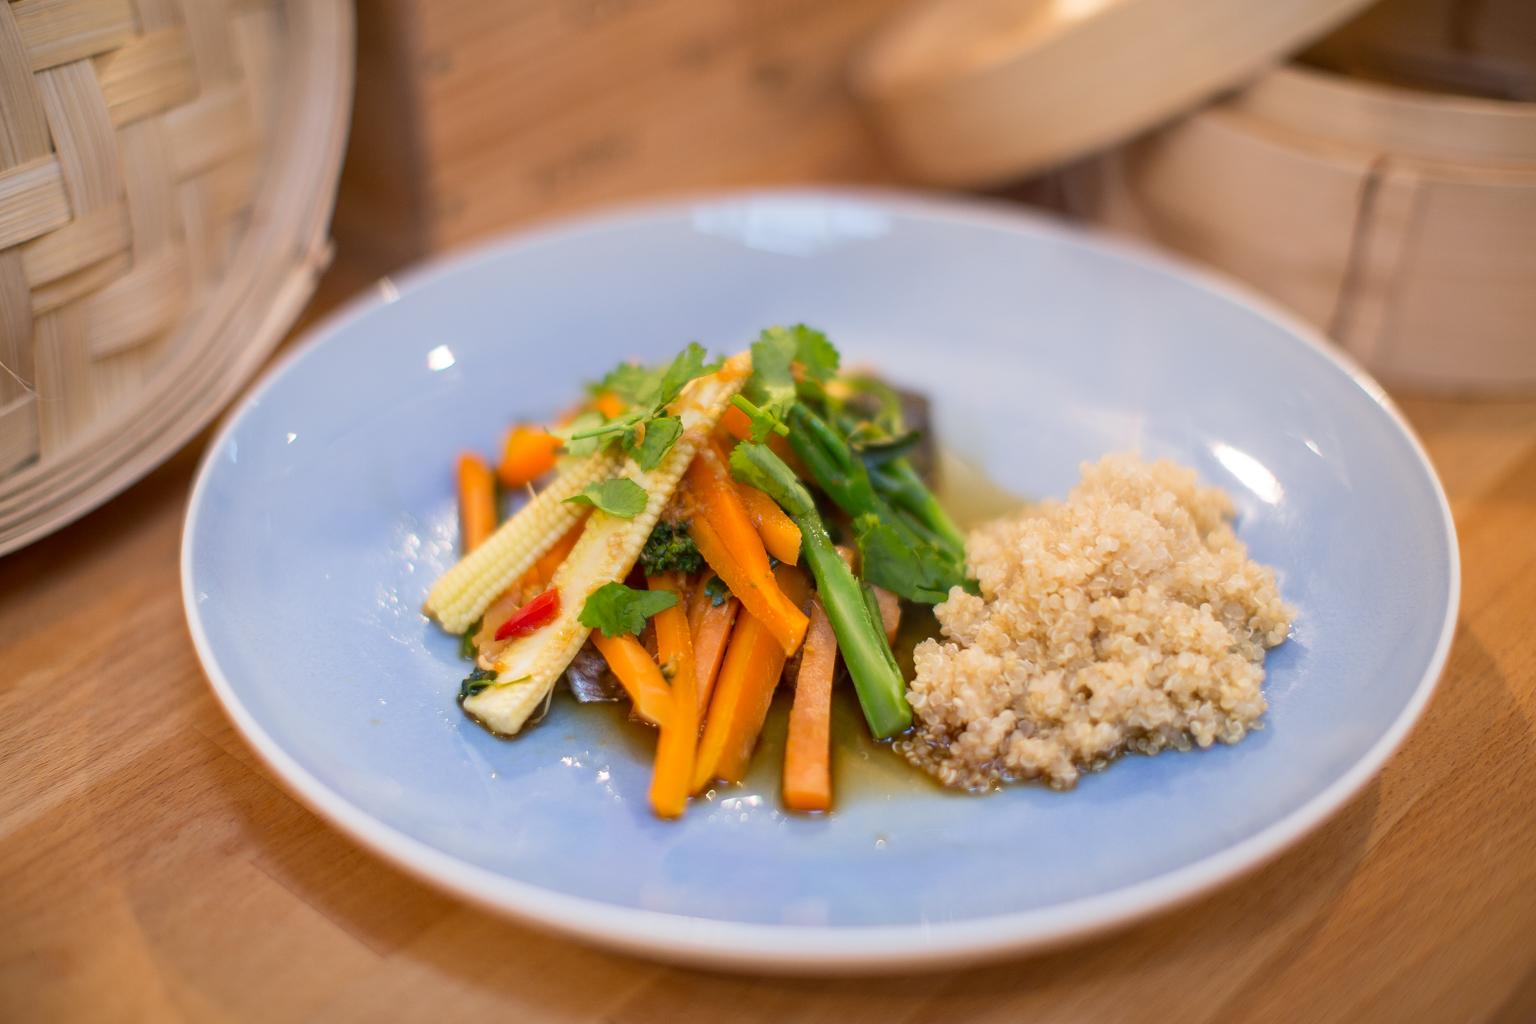 Fitness On Toast Faya Blog Girl Healthy Recipe Inspiratino Fish Steamed Seabass Ginger Carrot Wok Basket Bamboo Steam Diet Light-2